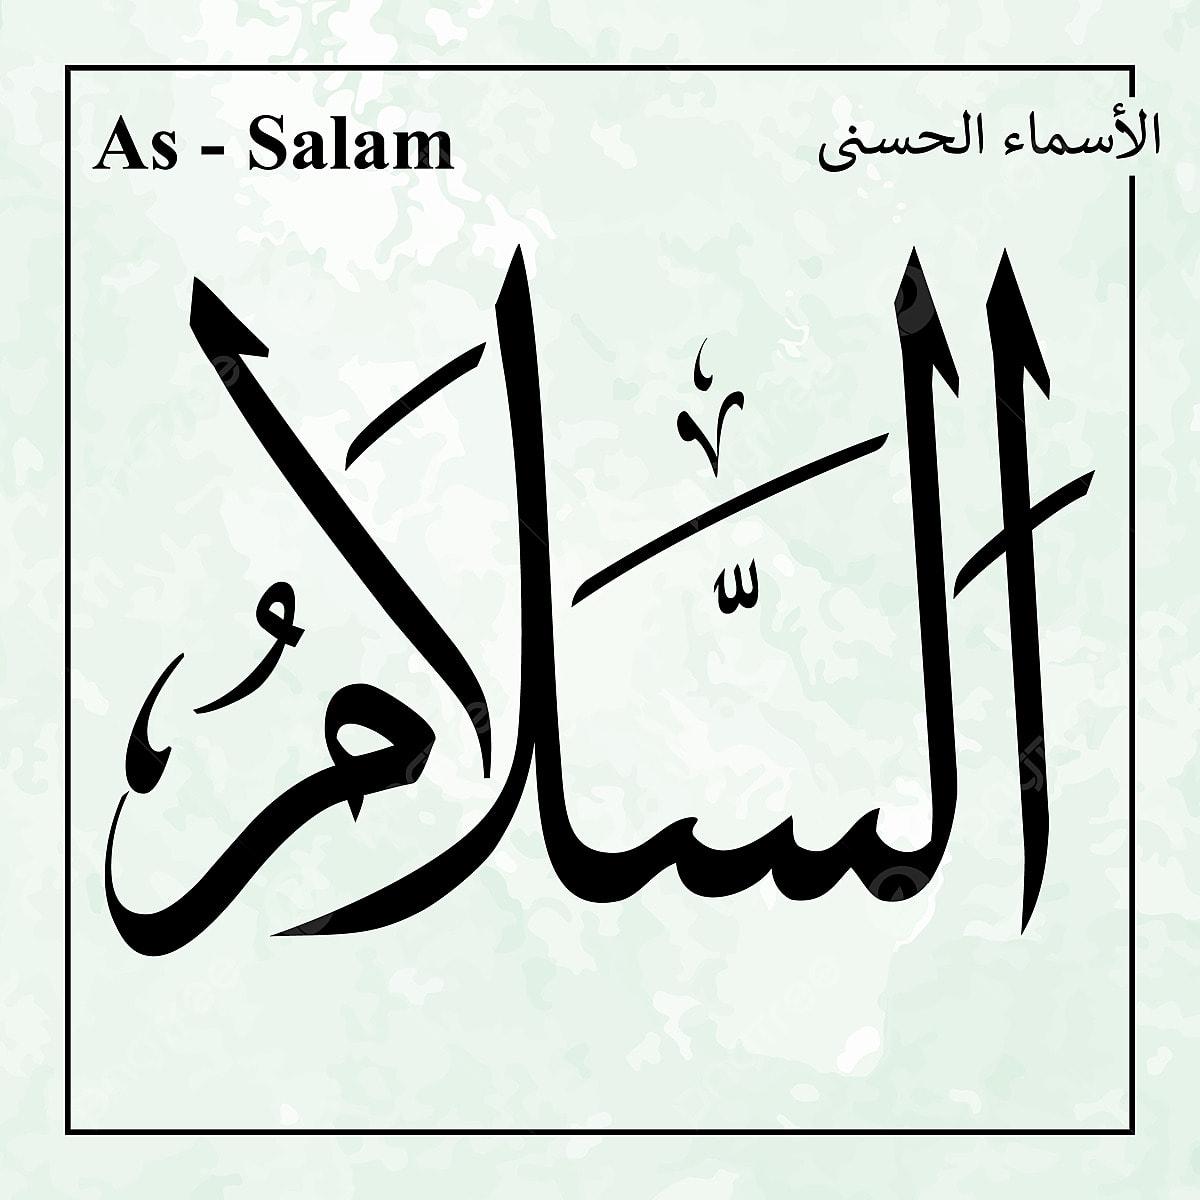 Sebagai Salam Asmaul Husna Seni Vektor Kaligrafi Arabic